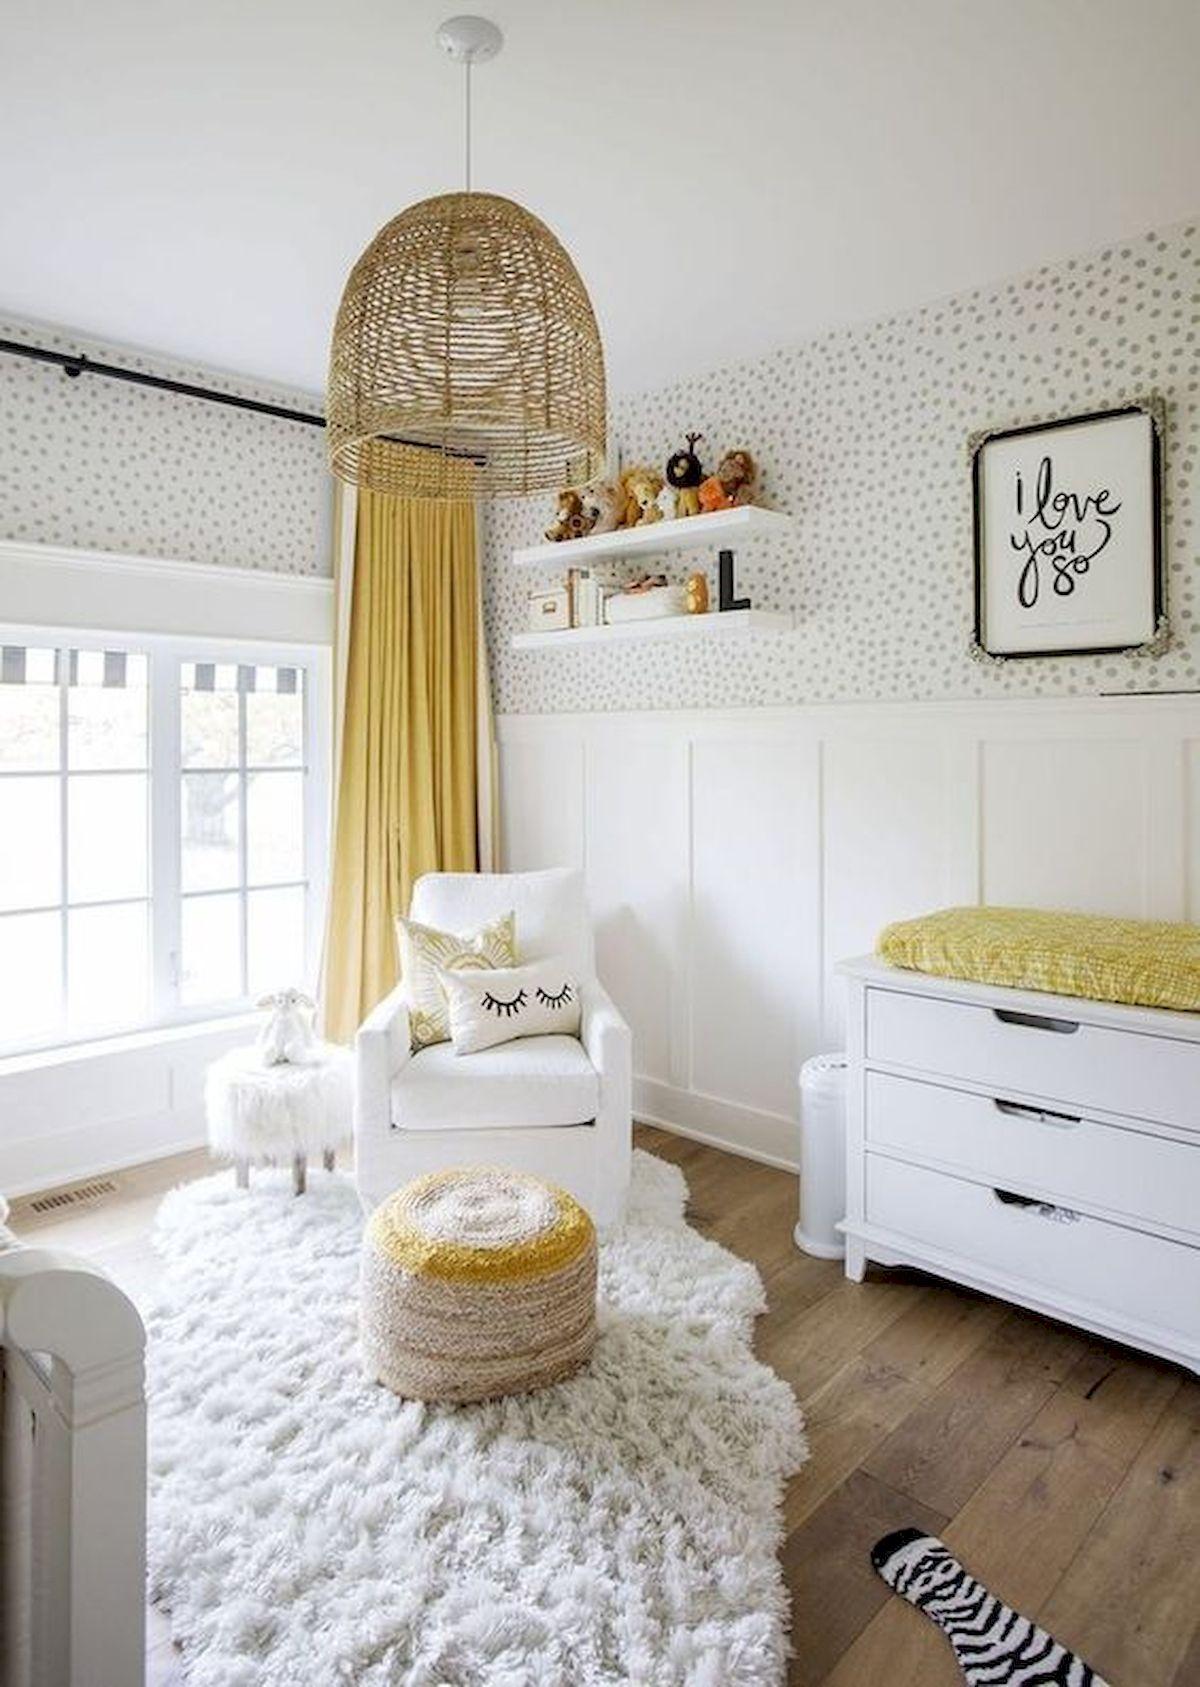 50 Amazing Modern Bedroom Decoration Ideas With Luxury Design (2)